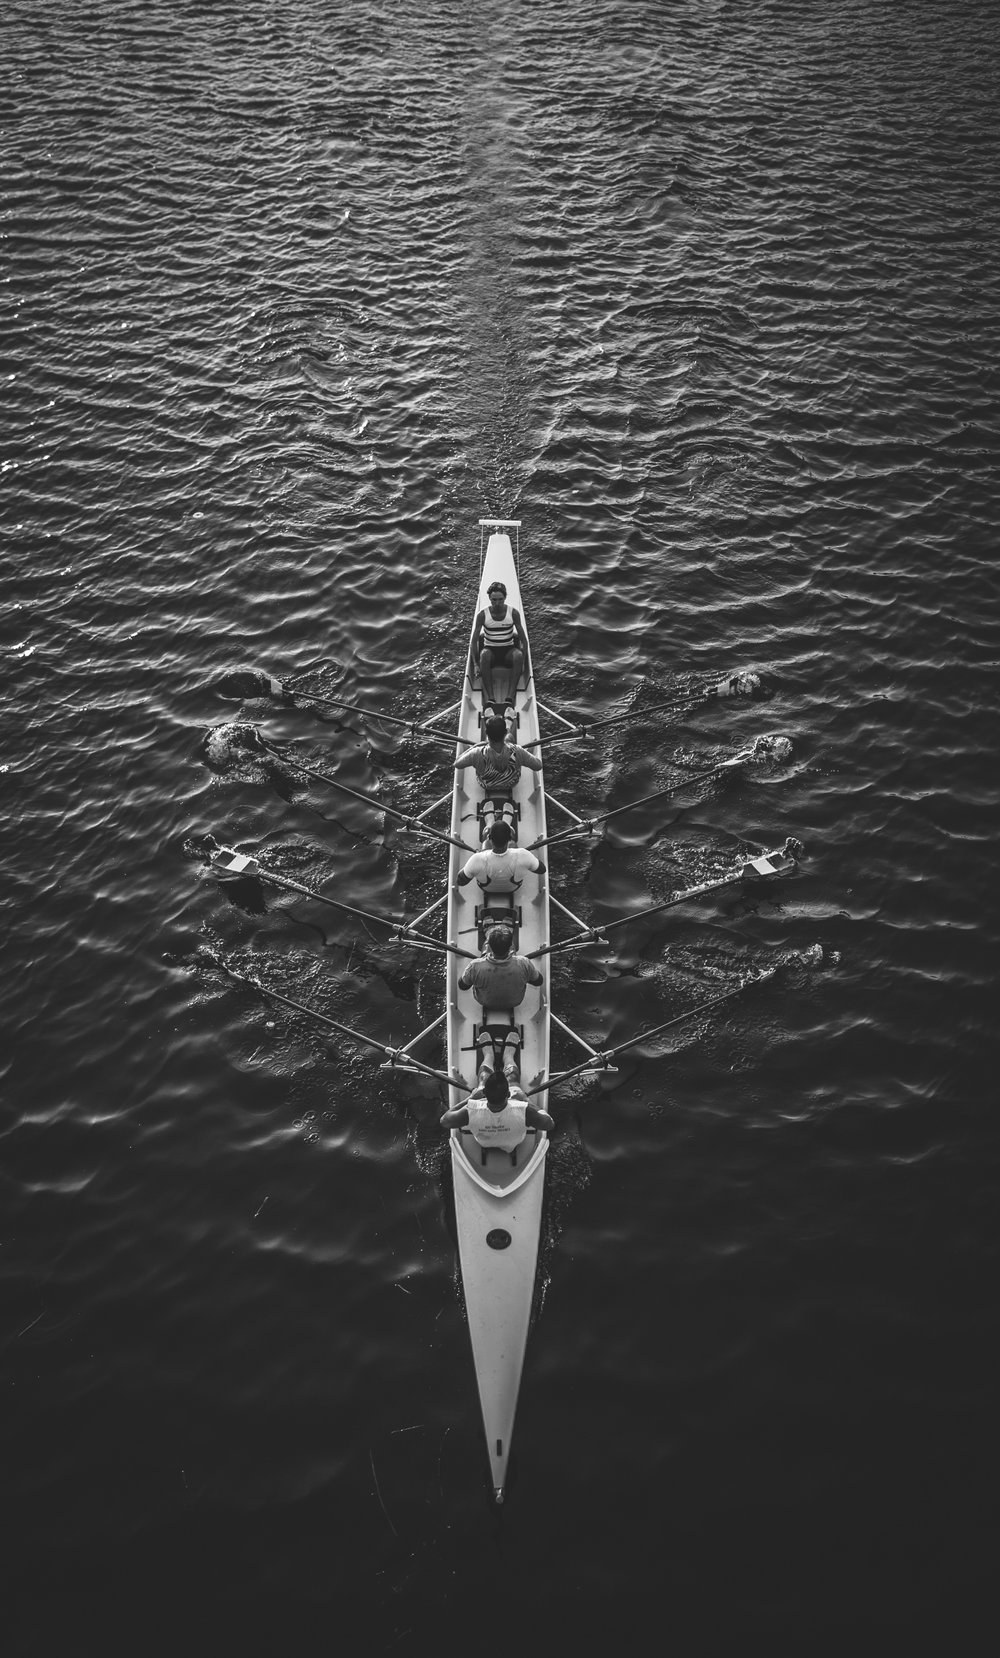 Unisus_International_School_Rowing_02.jpg